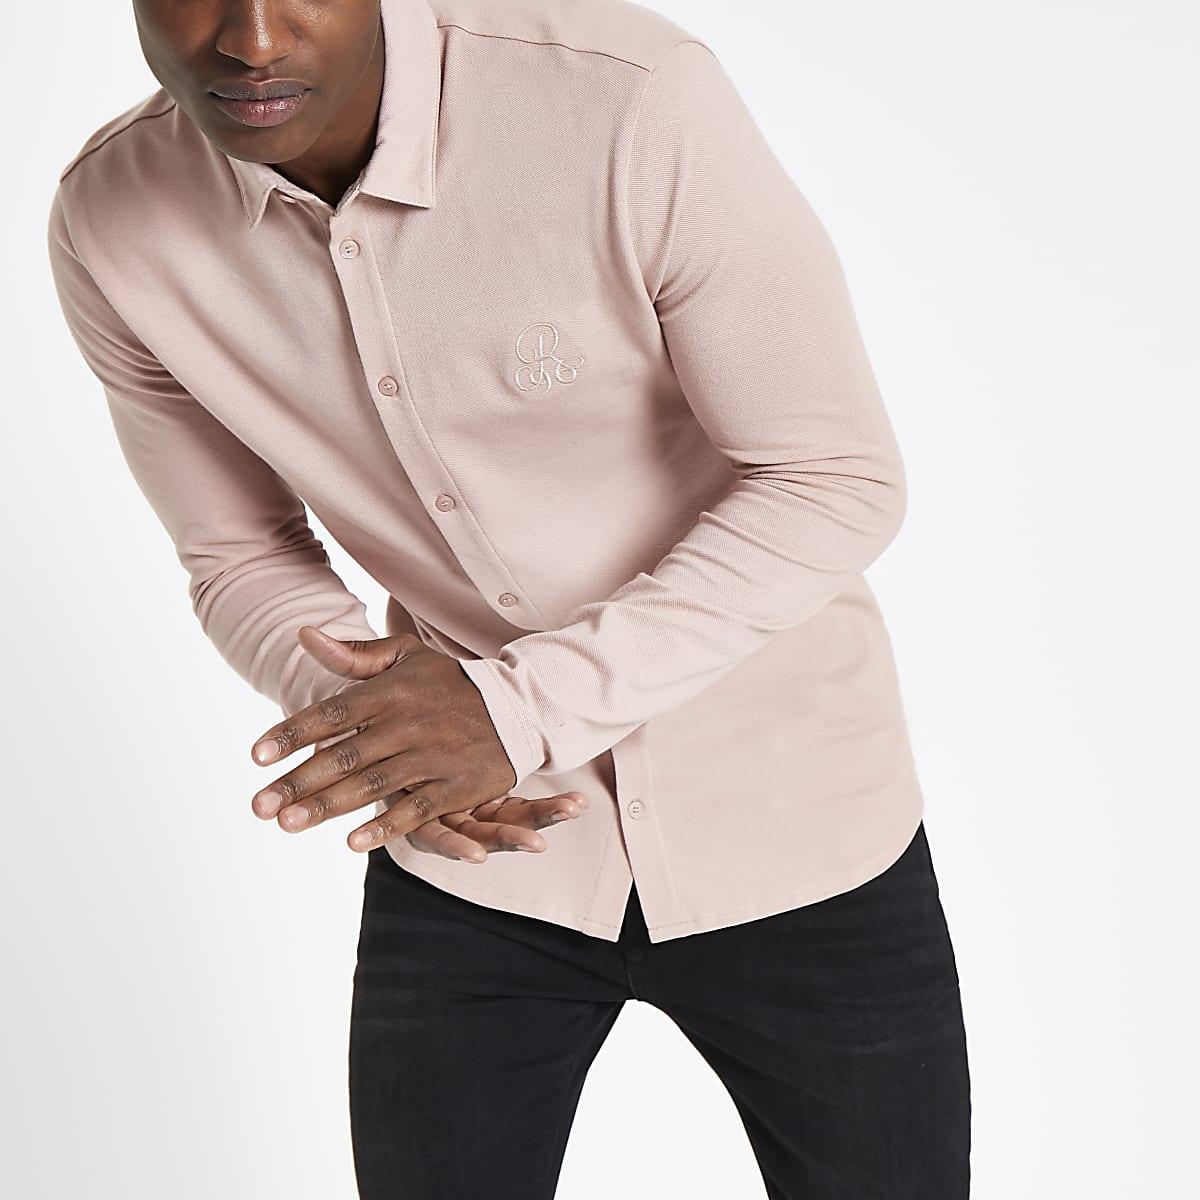 Chemise ajustée R96 rose boutonnée